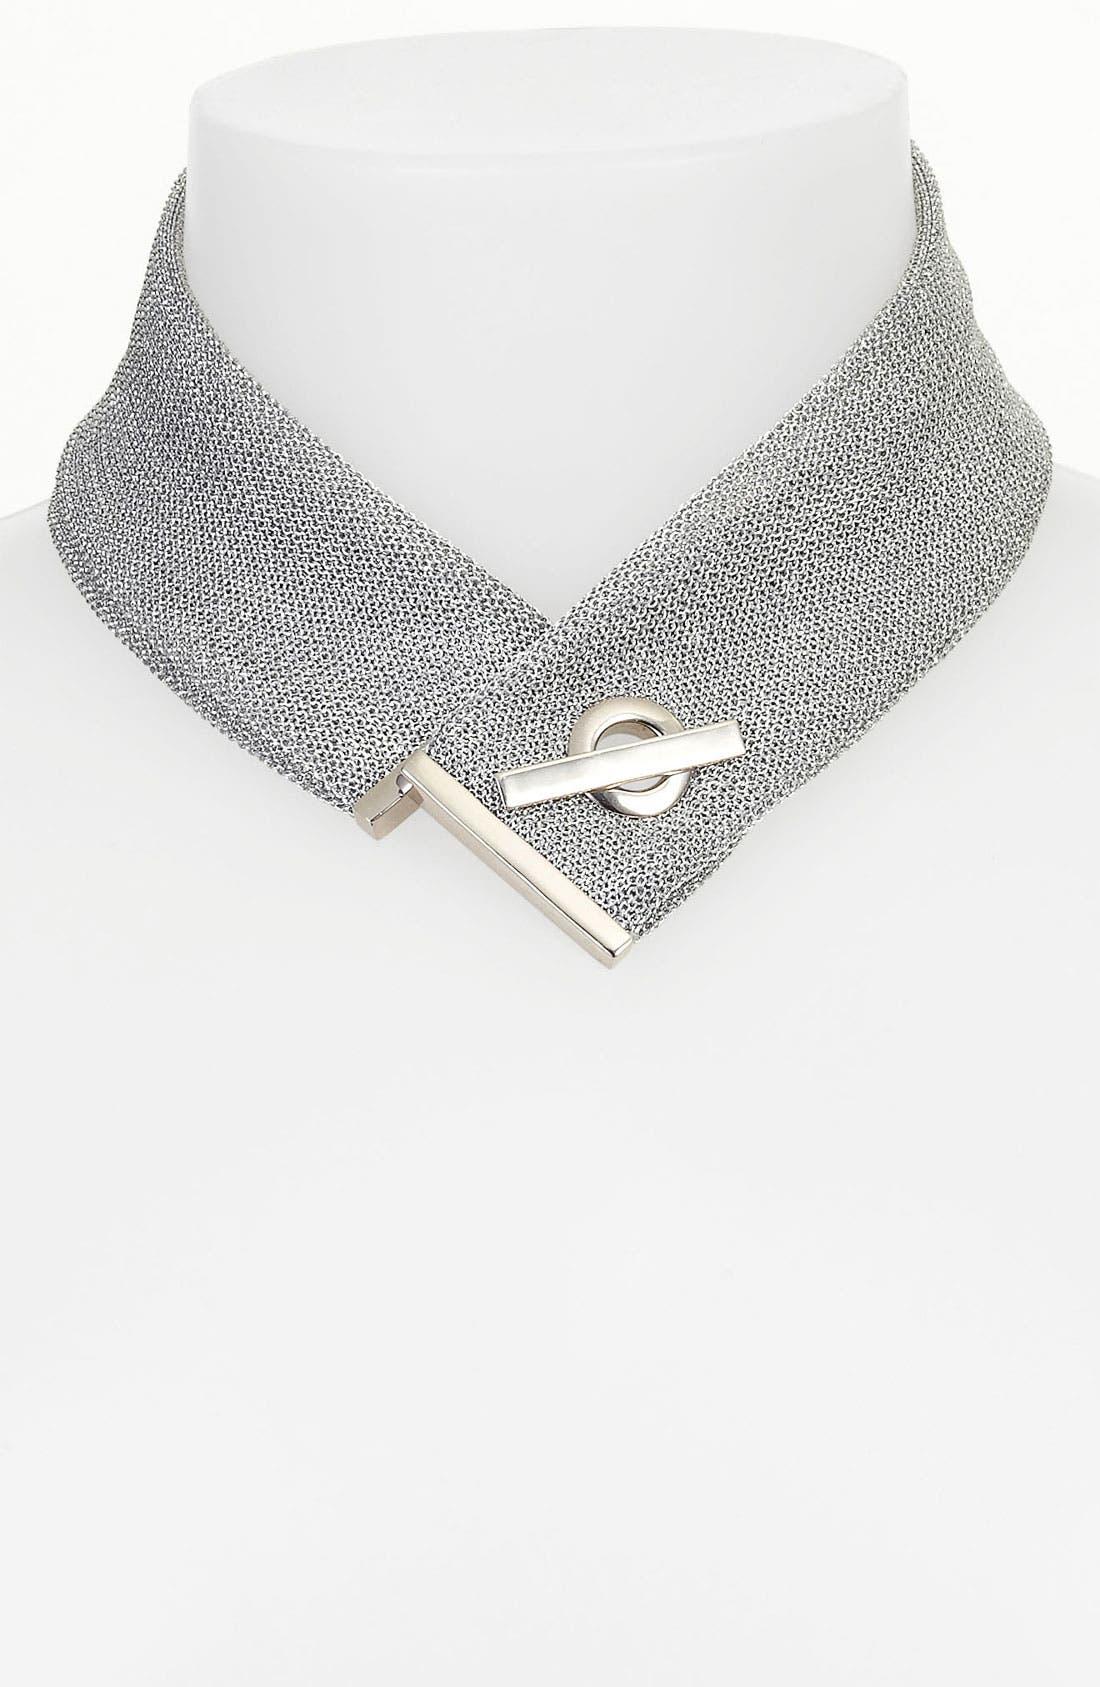 Alternate Image 1 Selected - Adami & Martucci 'Mesh' Collar Necklace (Nordstrom Exclusive)